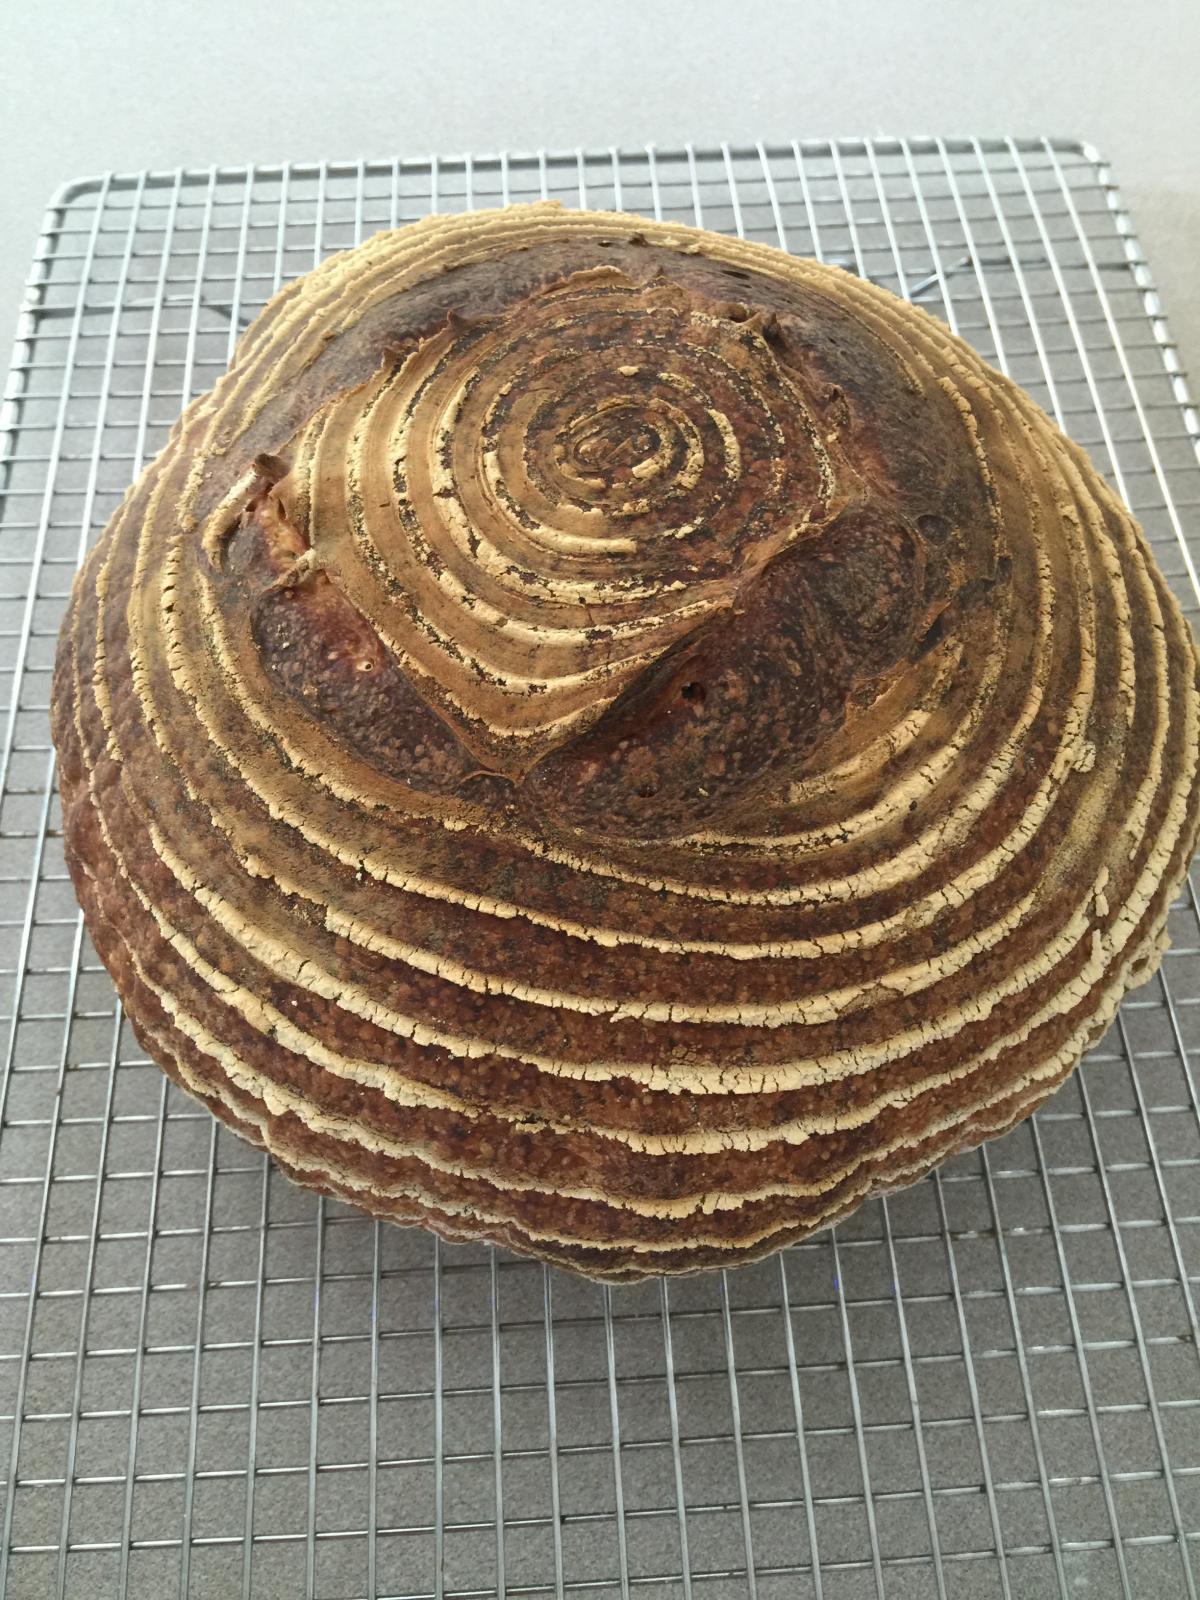 dfa1a6d2d2b Back at it - trying to take my bread to the next level